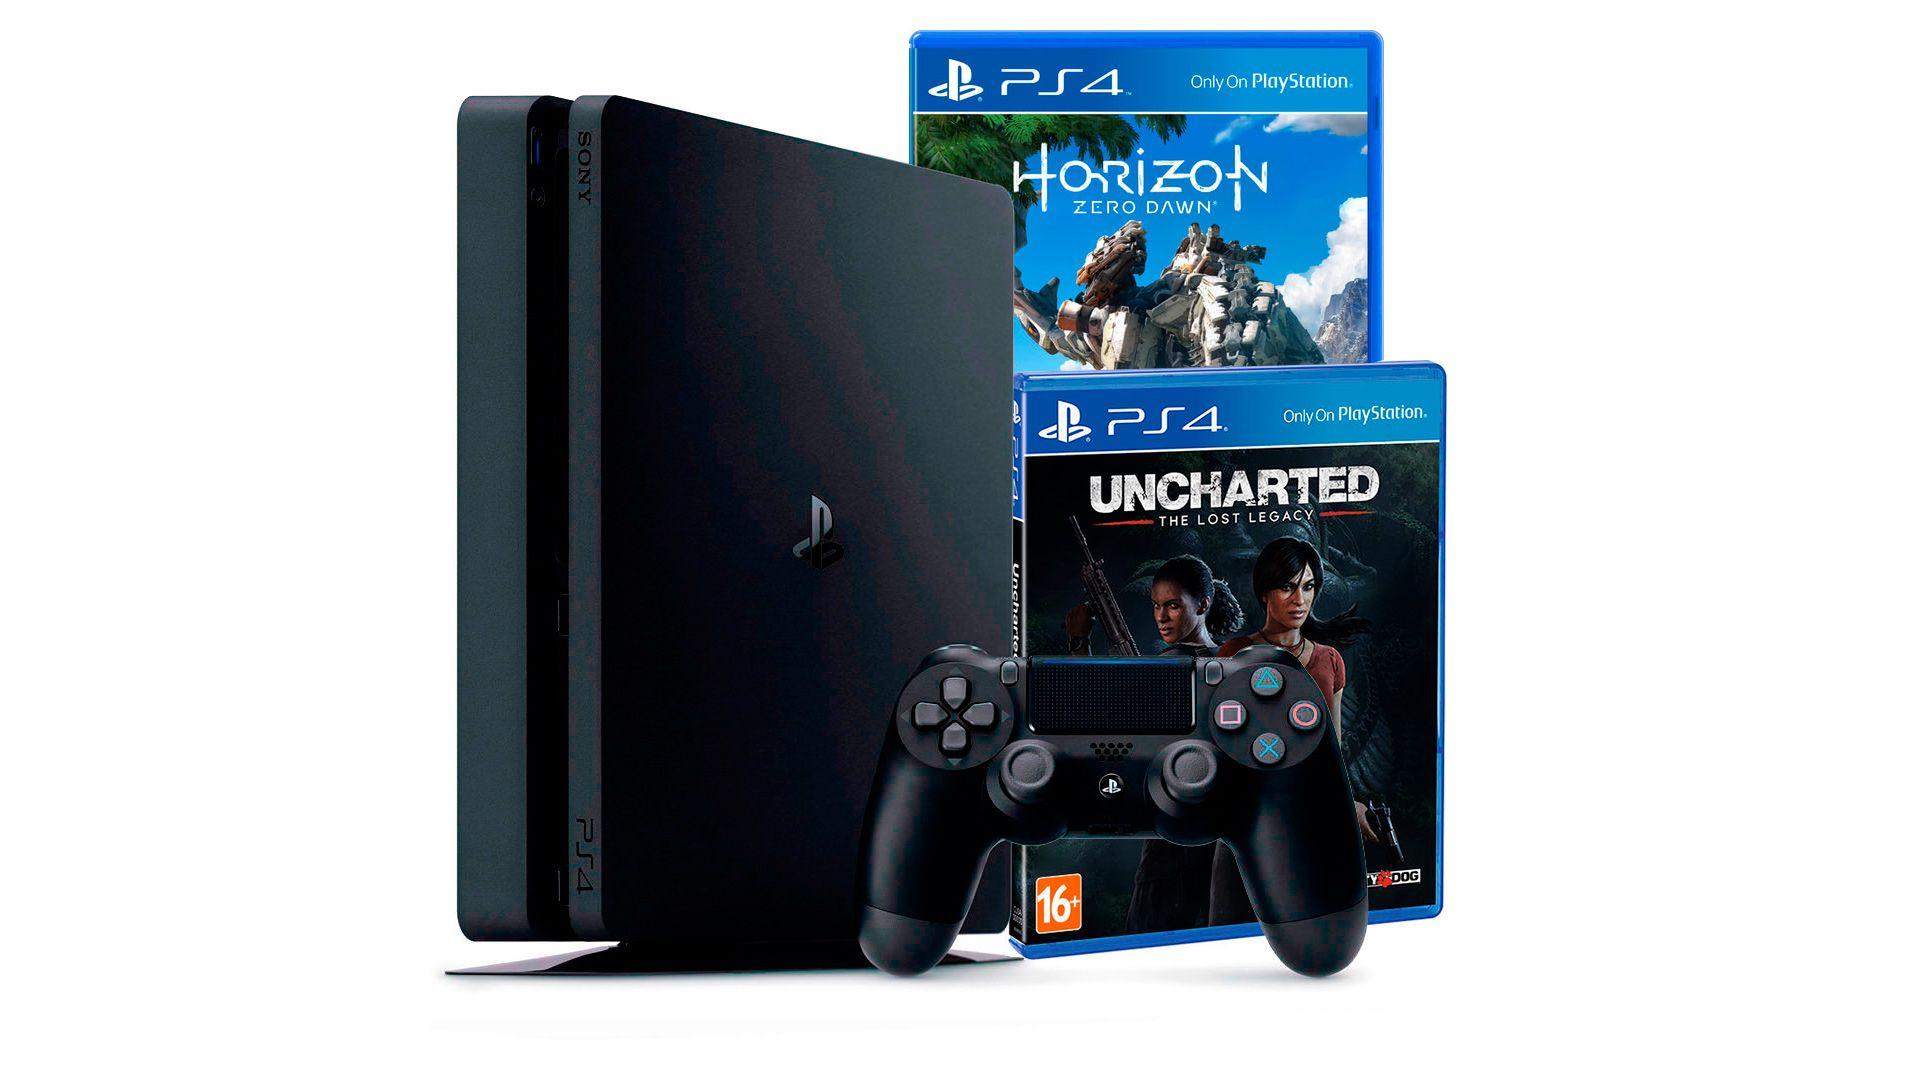 PlayStation 4 Slim 500Gb с играми Horizon Zero Dawn и Uncharted: Утраченное наследие [PS4S5HUZ]